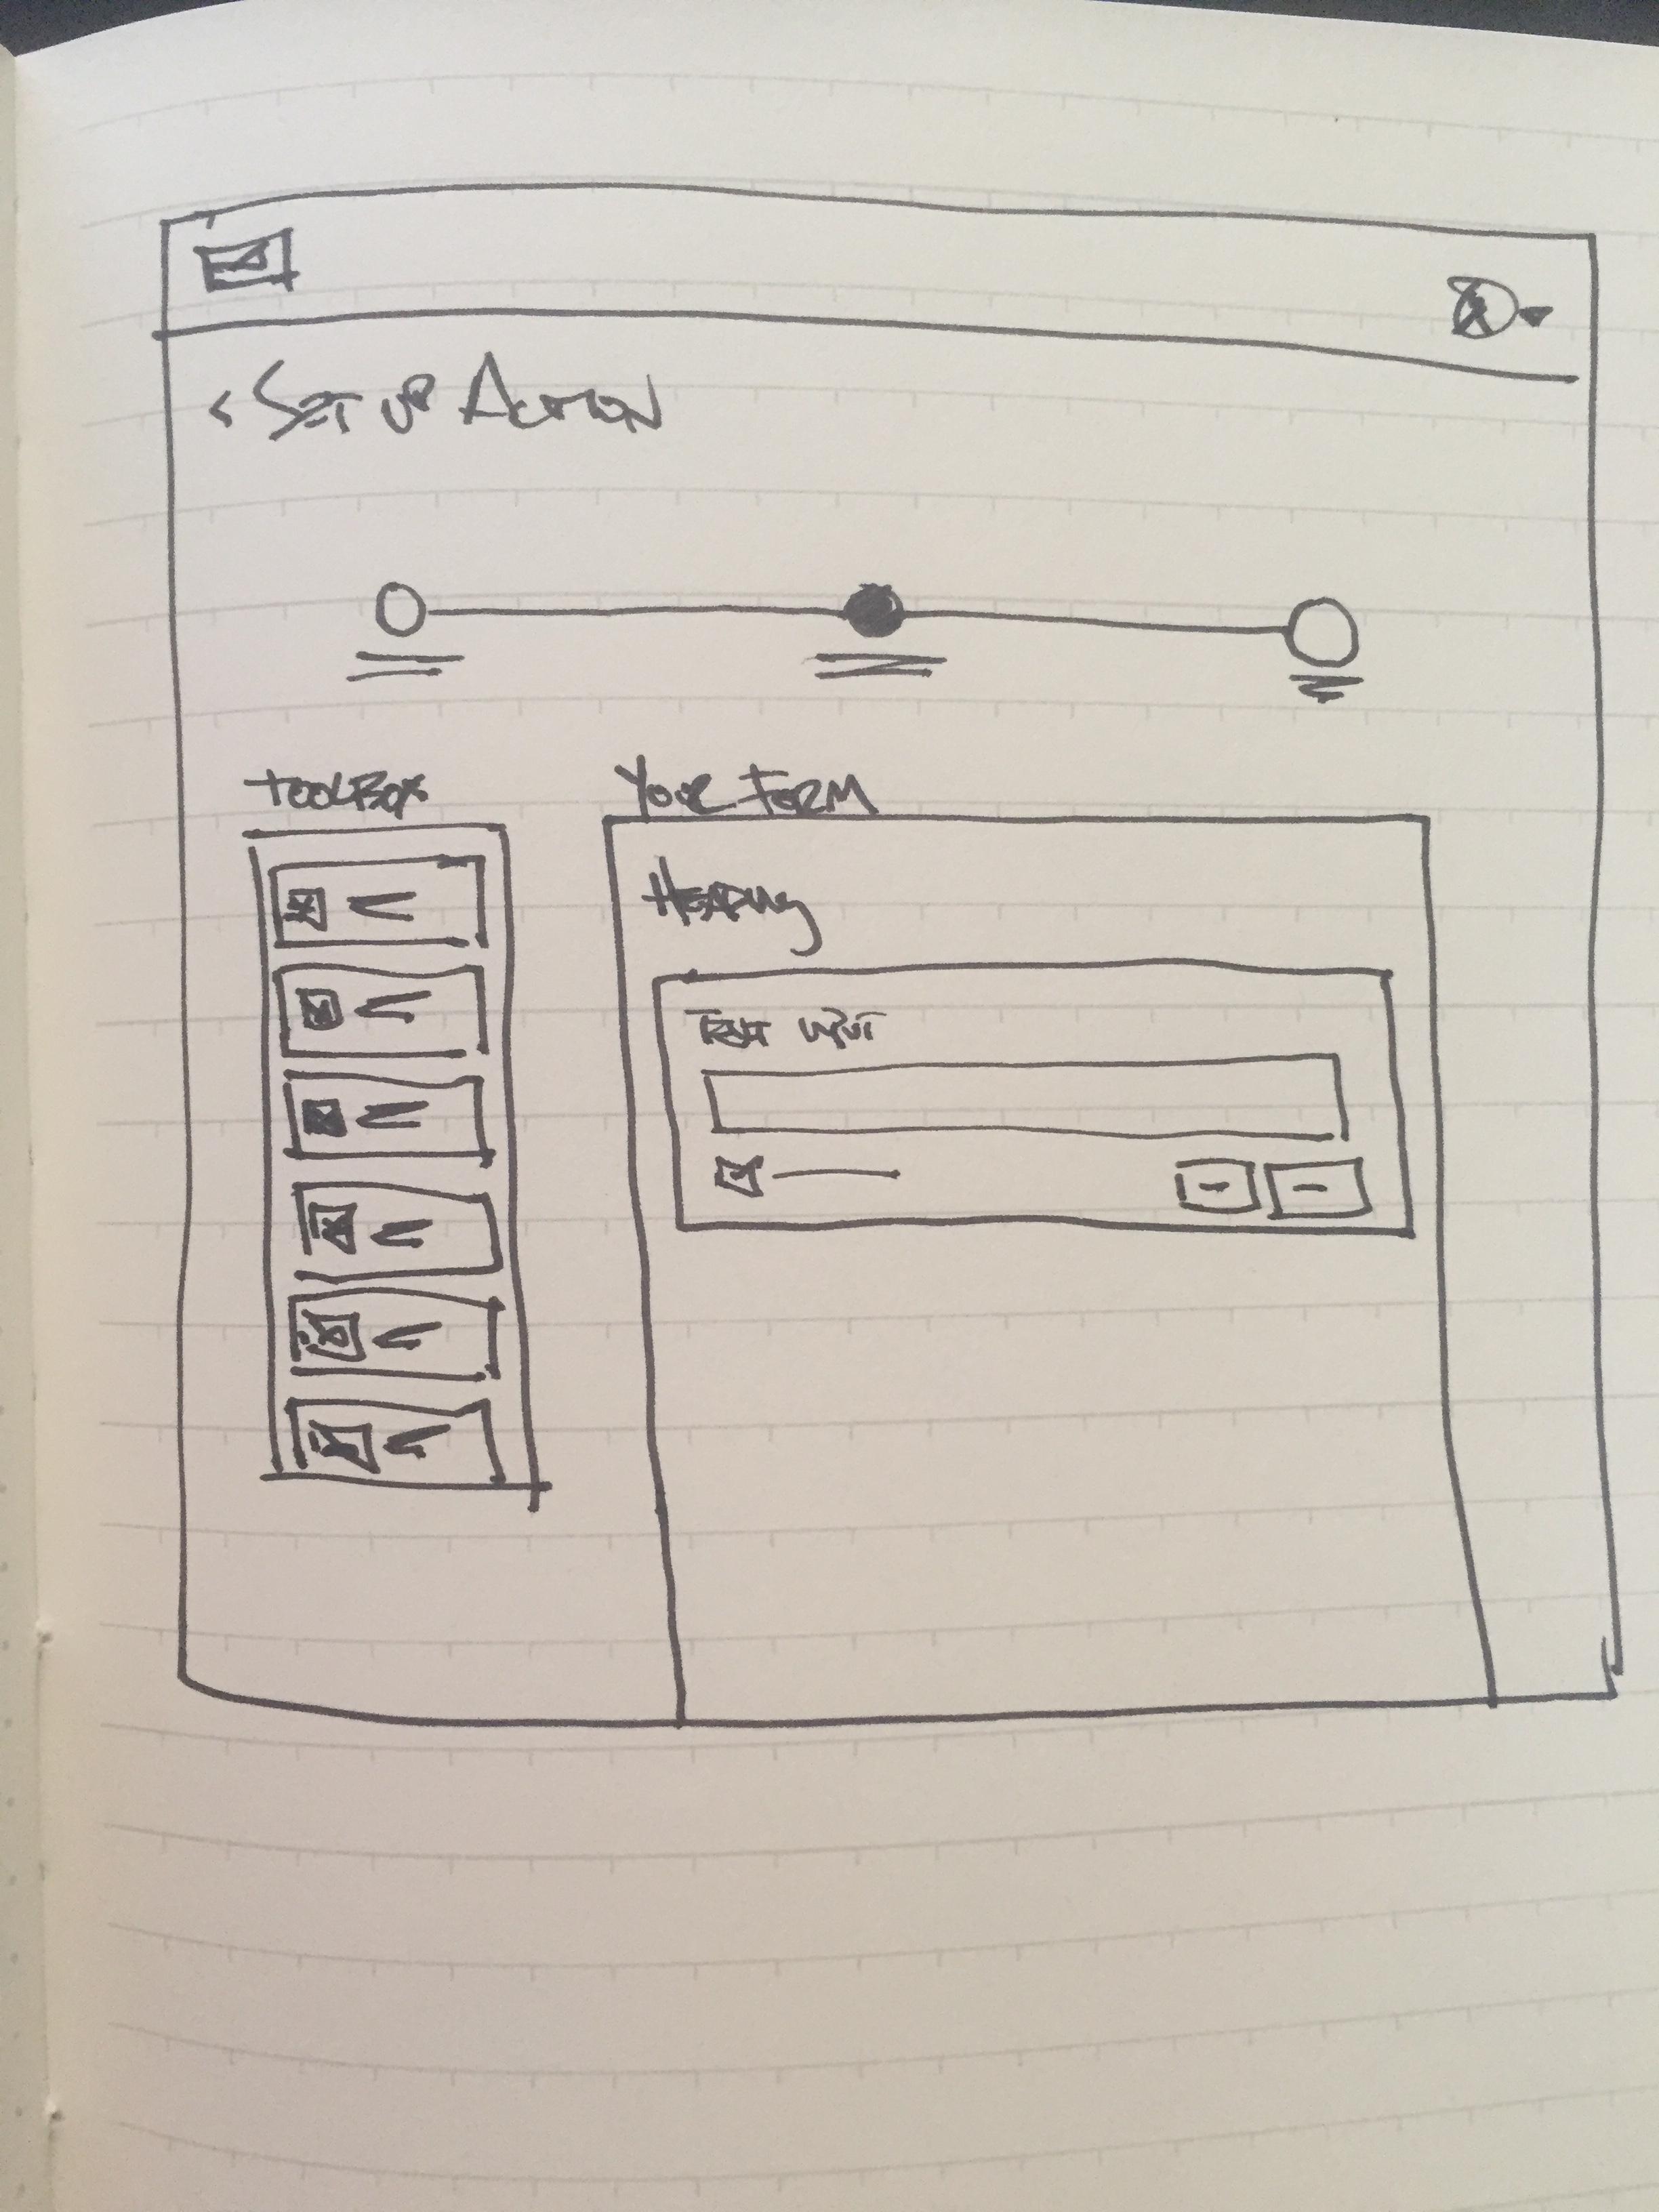 detailed UI sketch